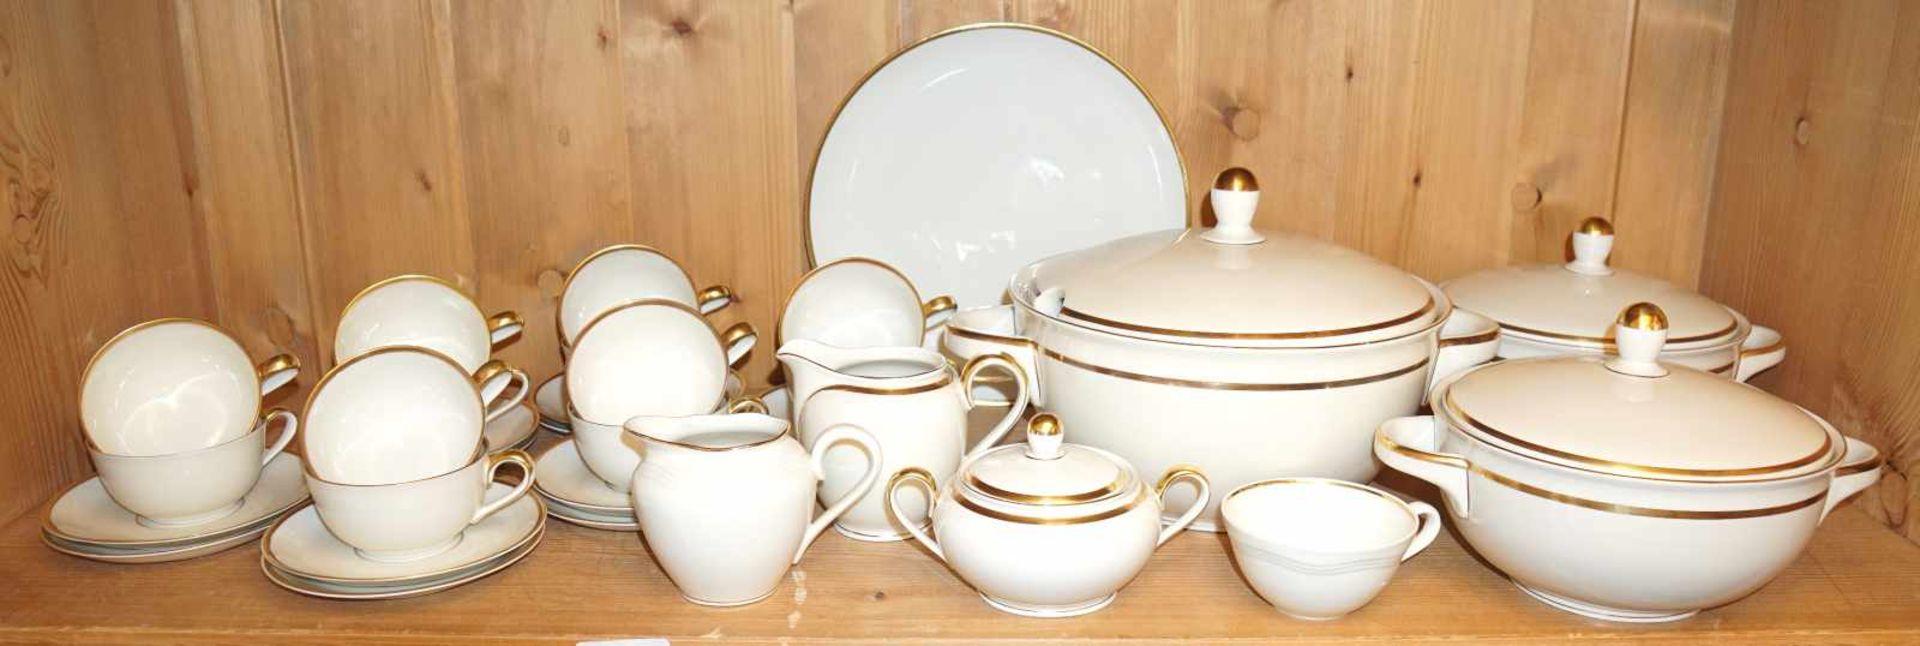 1 Kaffe-/Tee-/SpeiserestservicePorz. PLANKENHAMMER goldstaff. f. ca. 12 Pers. ber. Asp. - Bild 3 aus 3